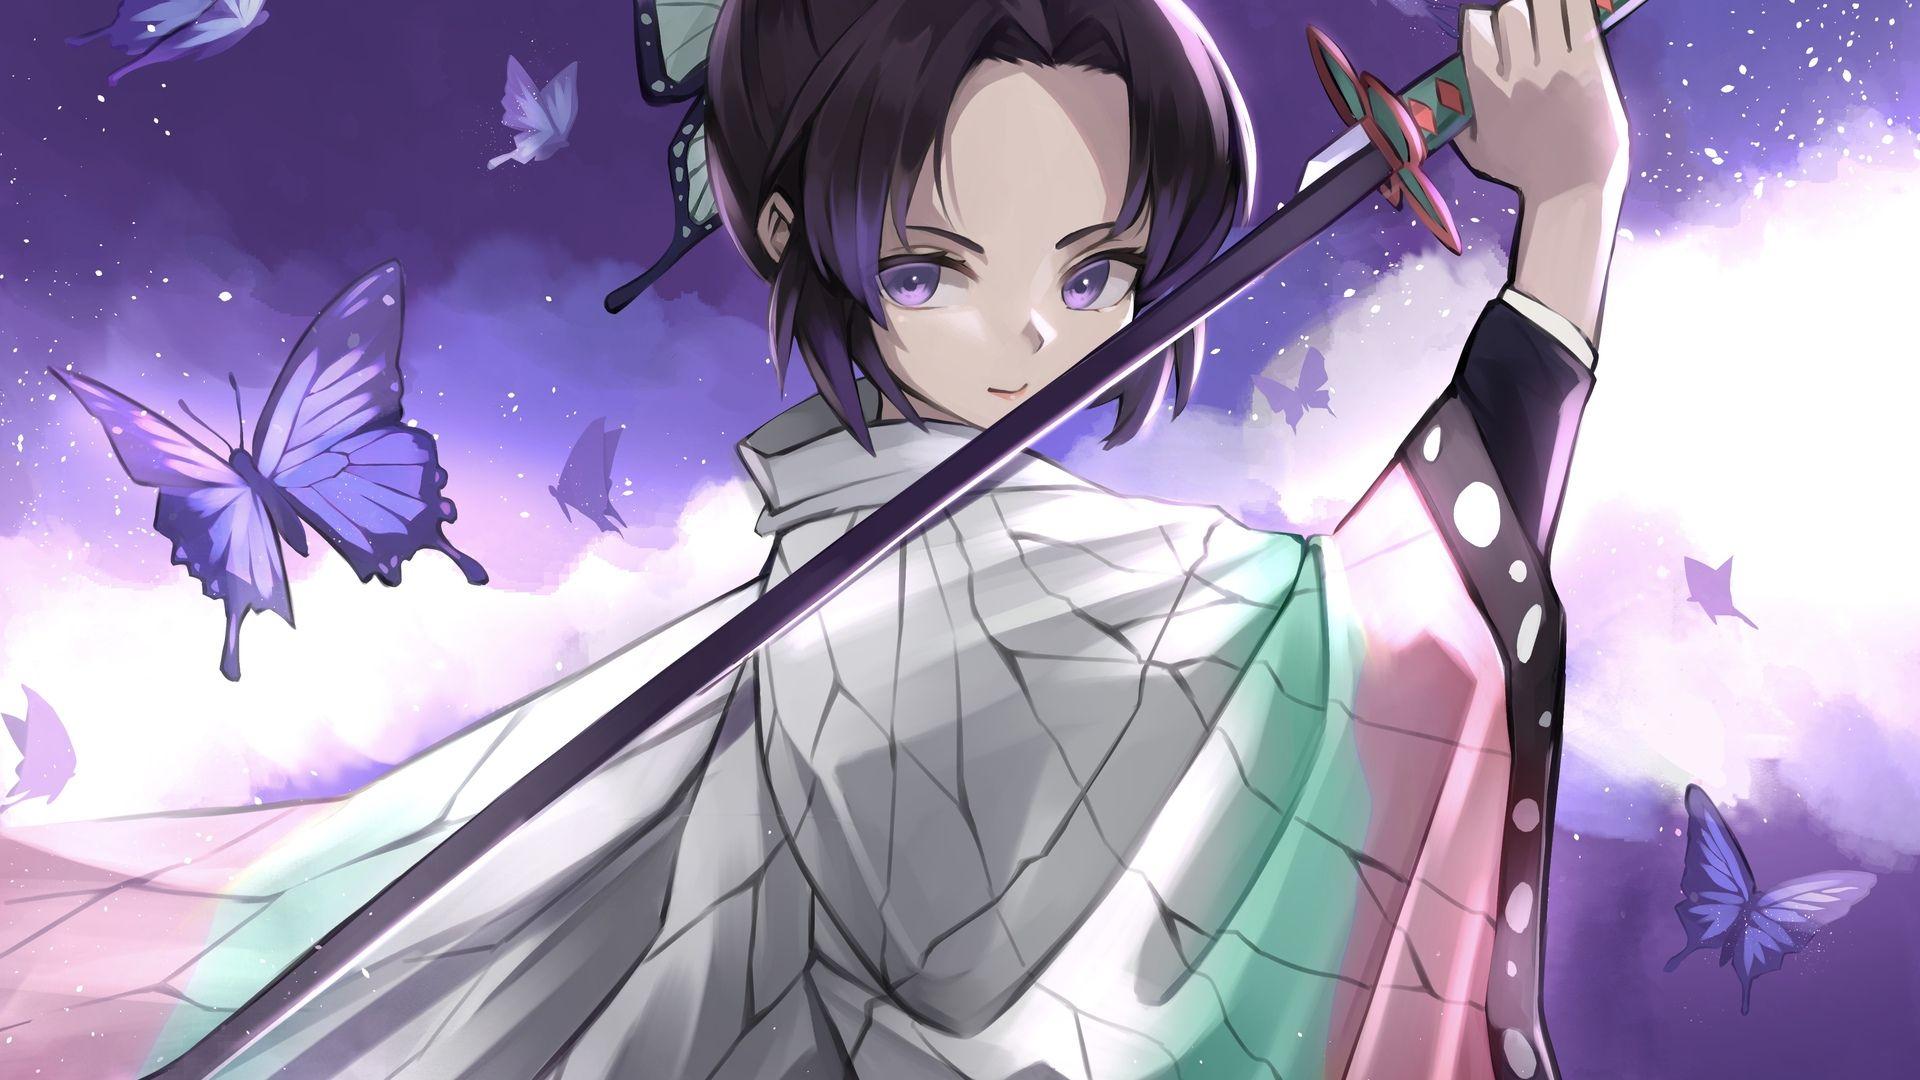 Anime Demon Girl 1080p Wallpapers - Wallpaper Cave